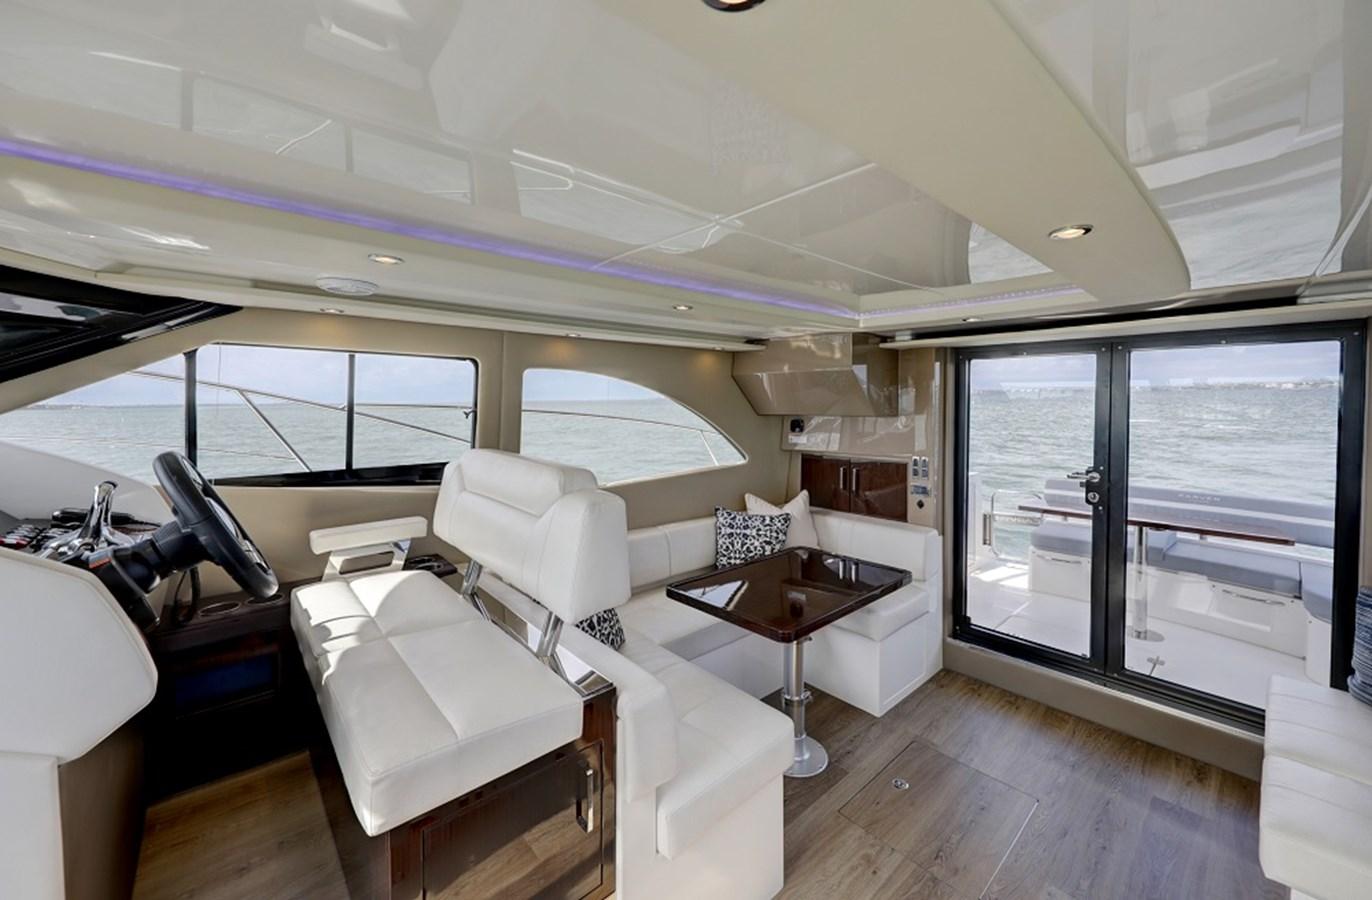 B44A5752_3_4_5_6 2020 CARVER C40 Command Bridge Motor Yacht 2825087